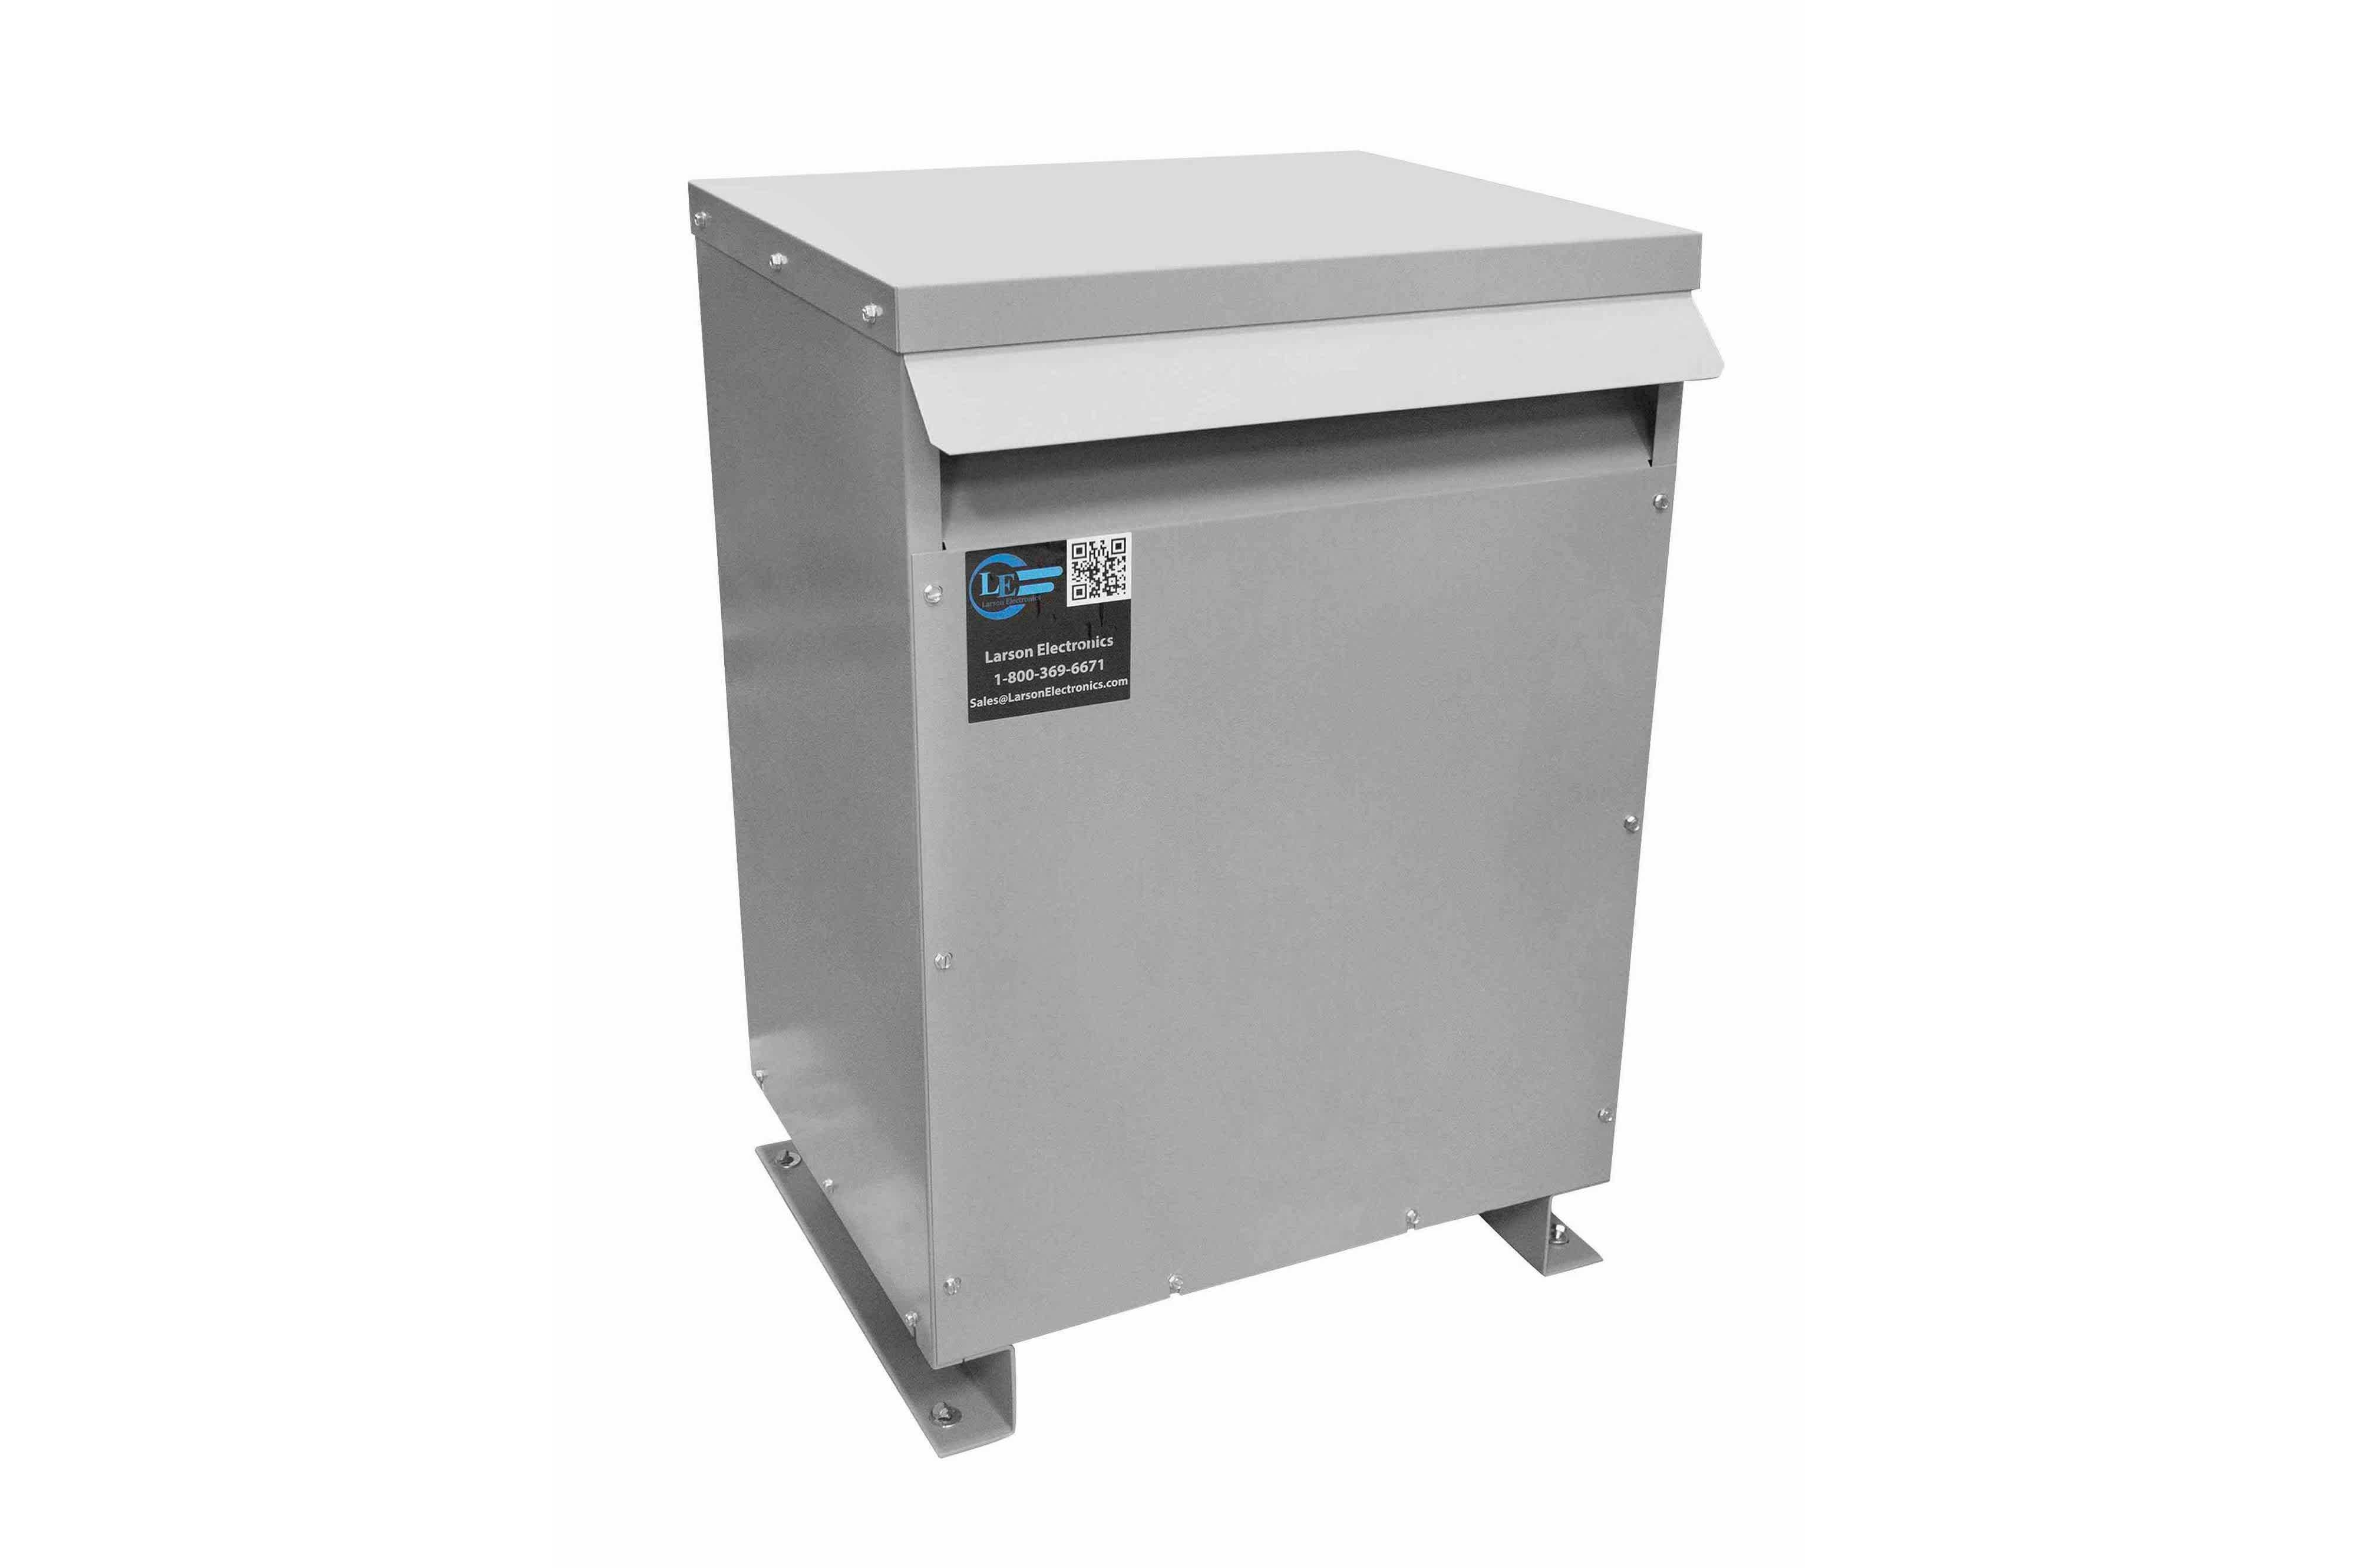 26 kVA 3PH Isolation Transformer, 400V Wye Primary, 480Y/277 Wye-N Secondary, N3R, Ventilated, 60 Hz